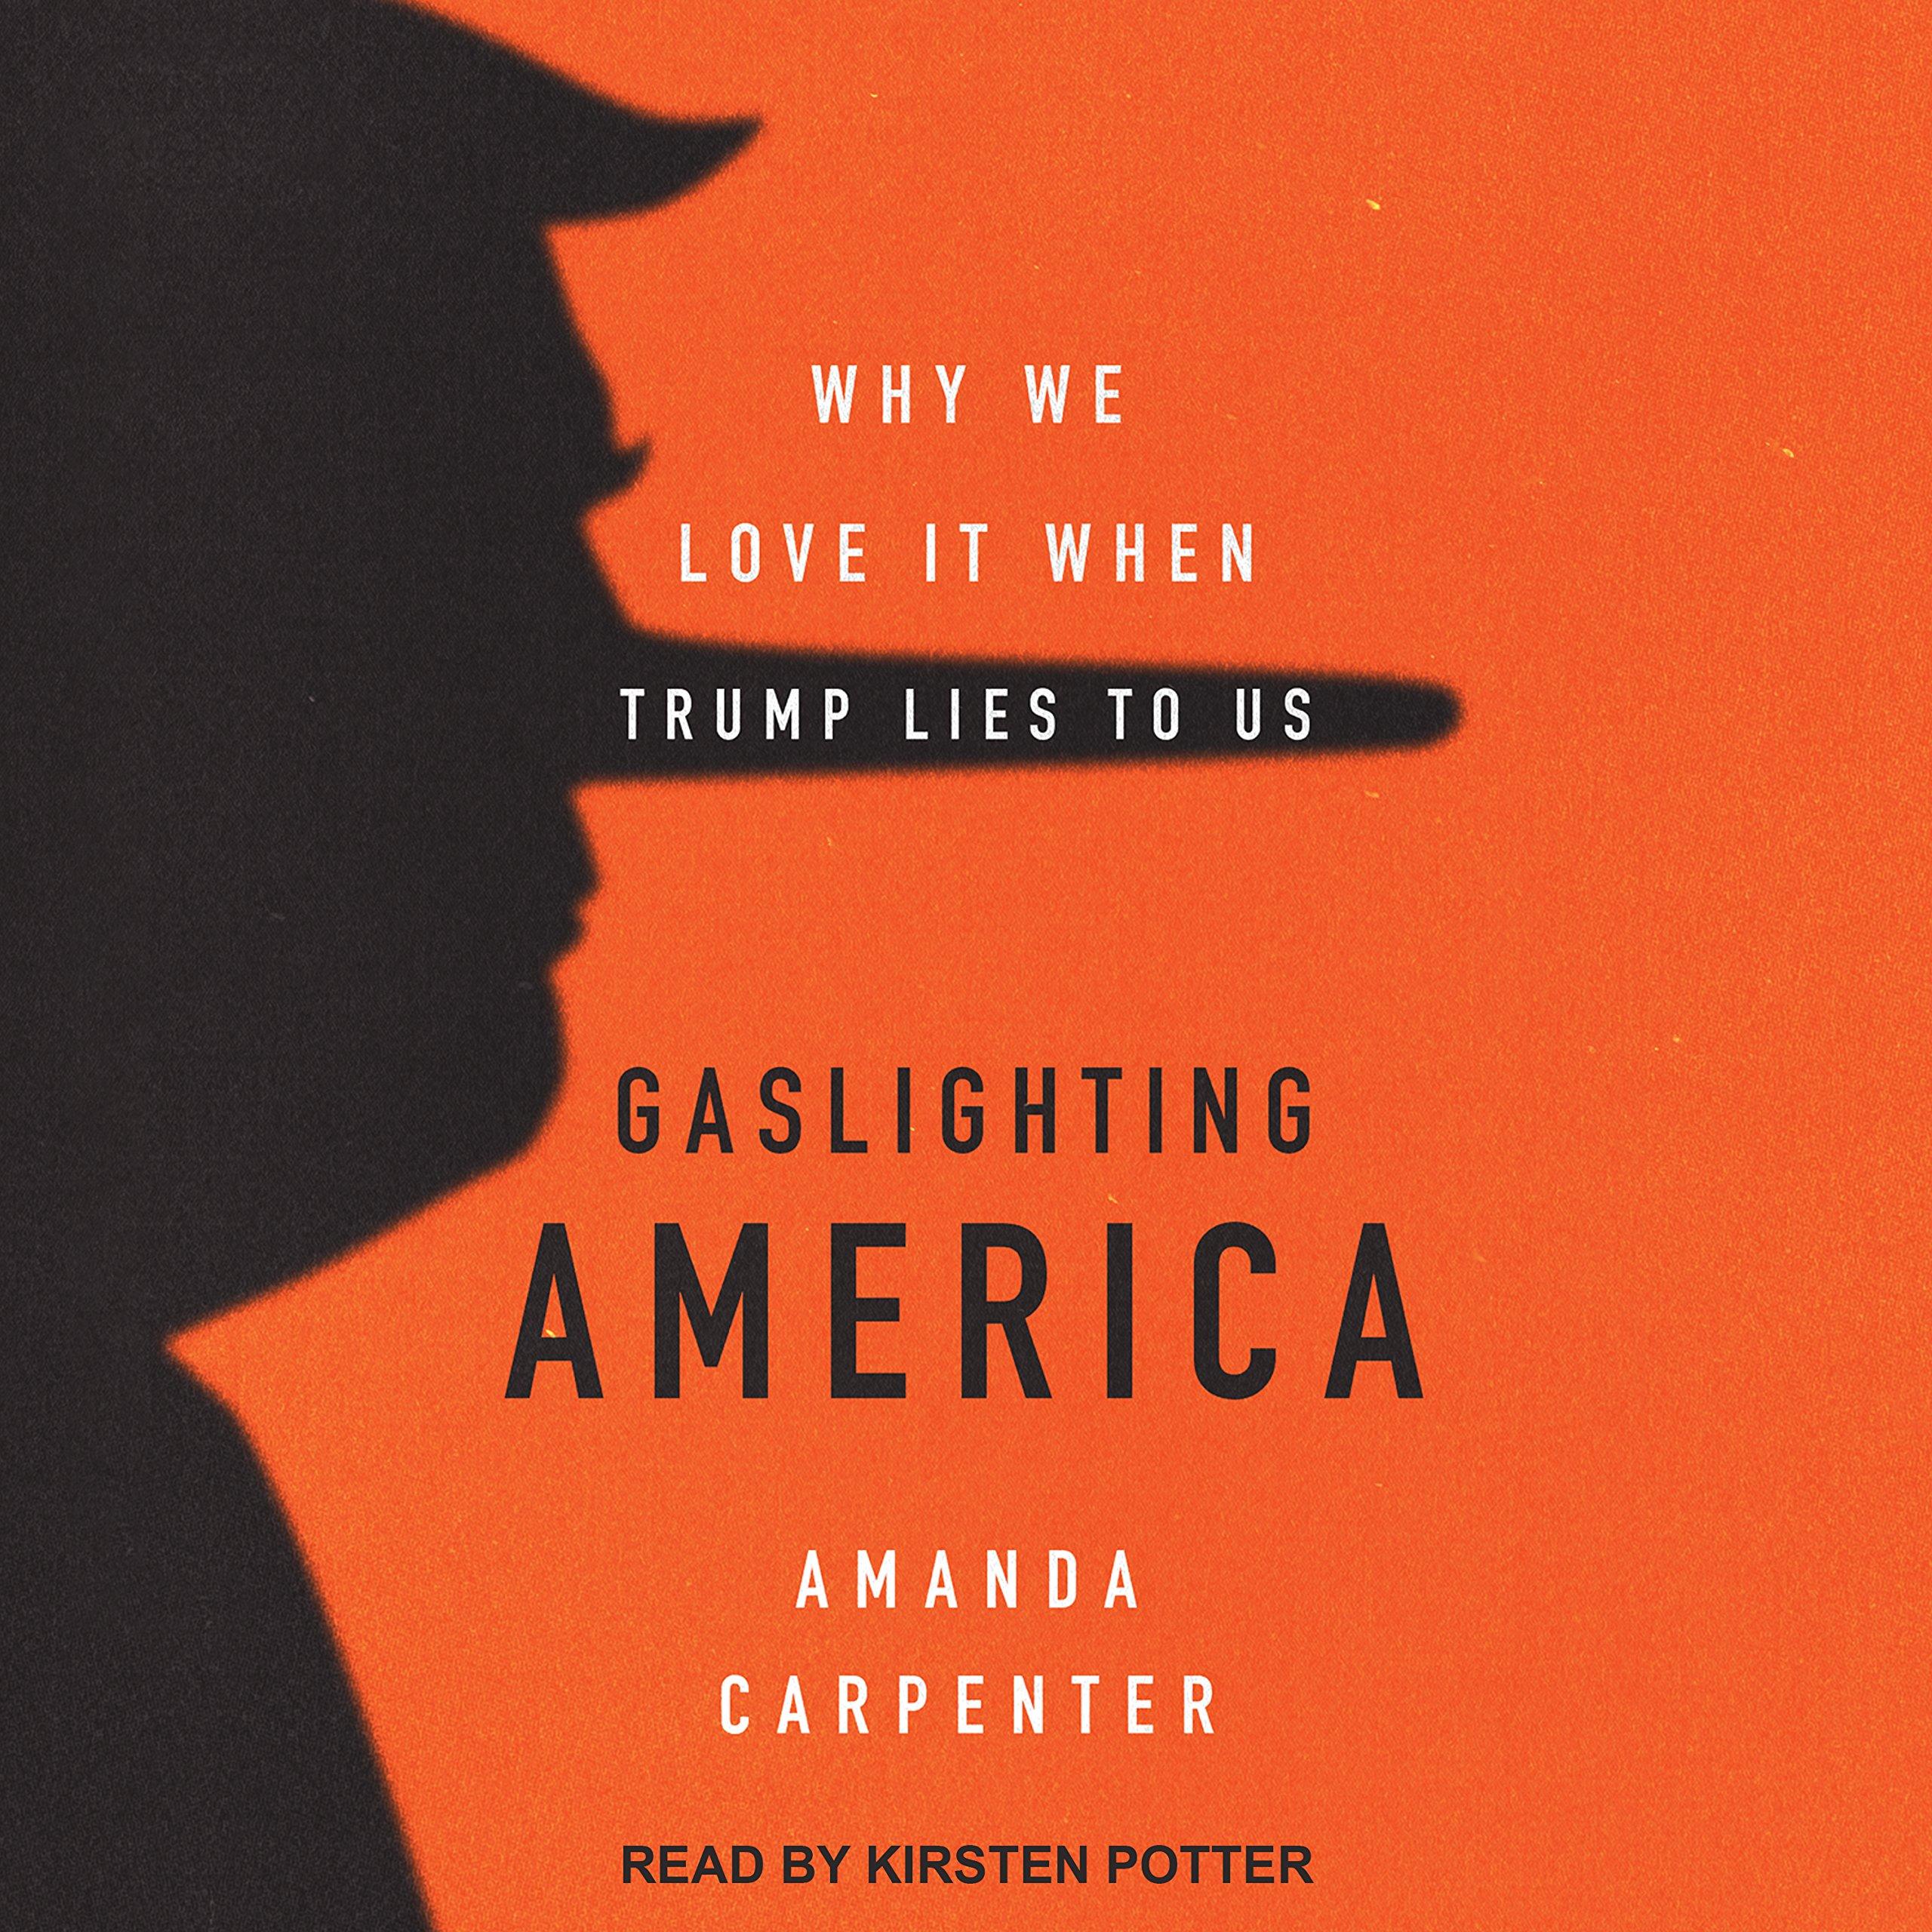 Gaslighting America: Why We Love It When Trump Lies to Us ...